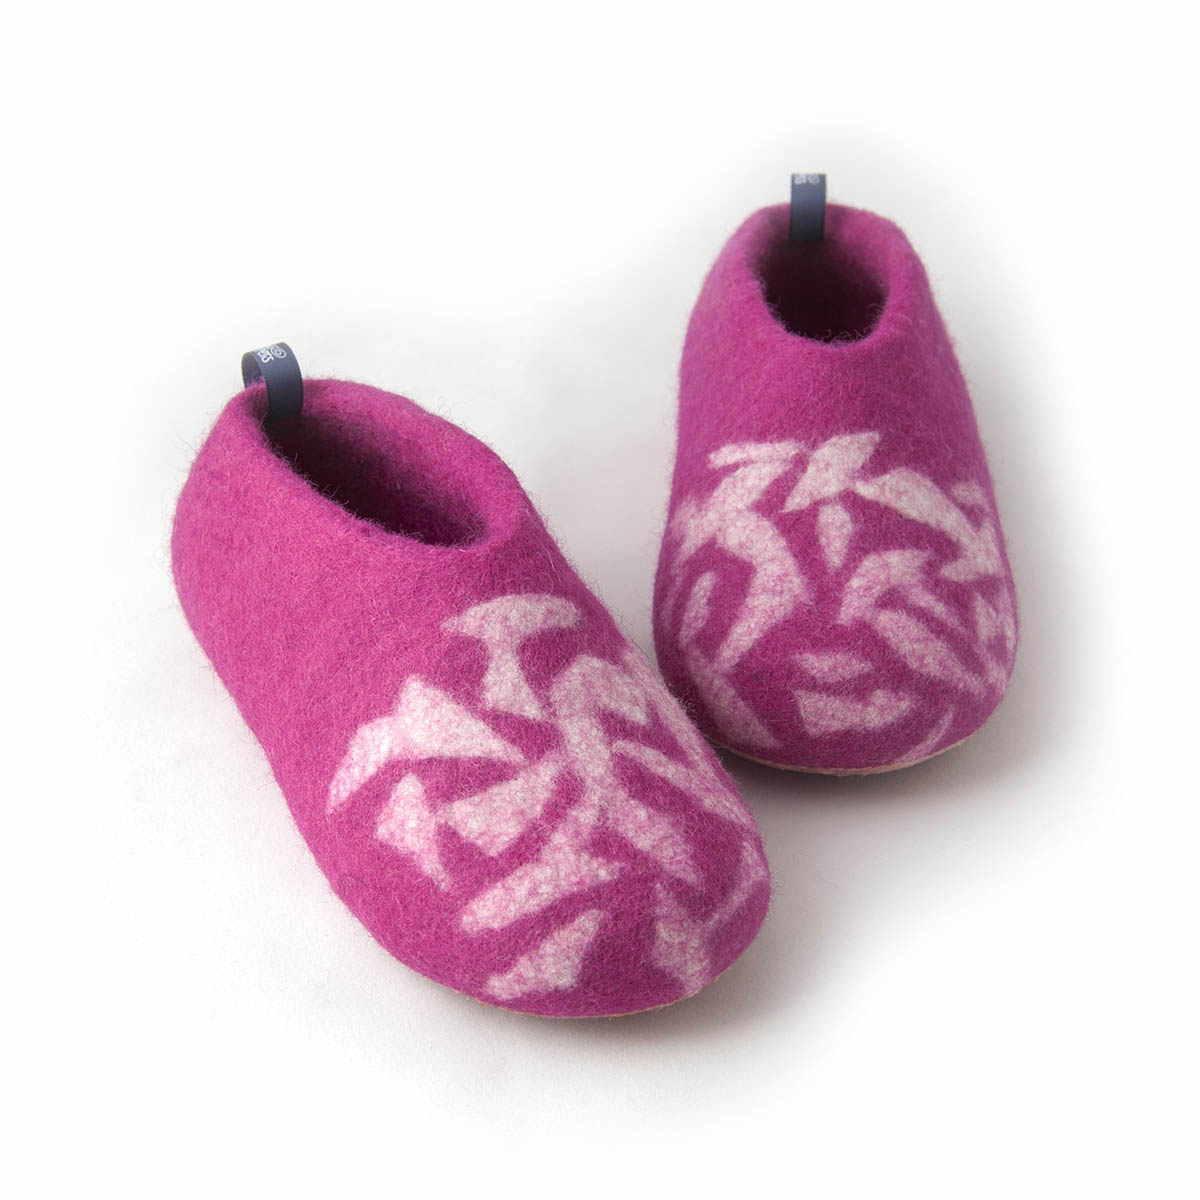 85d2831026b Wooppers - Χειμωνιάτικες παιδικές παντόφλες BITS φούξια -c. Latex σόλες για  τα παιδικά παντοφλάκια Wooppers. Next